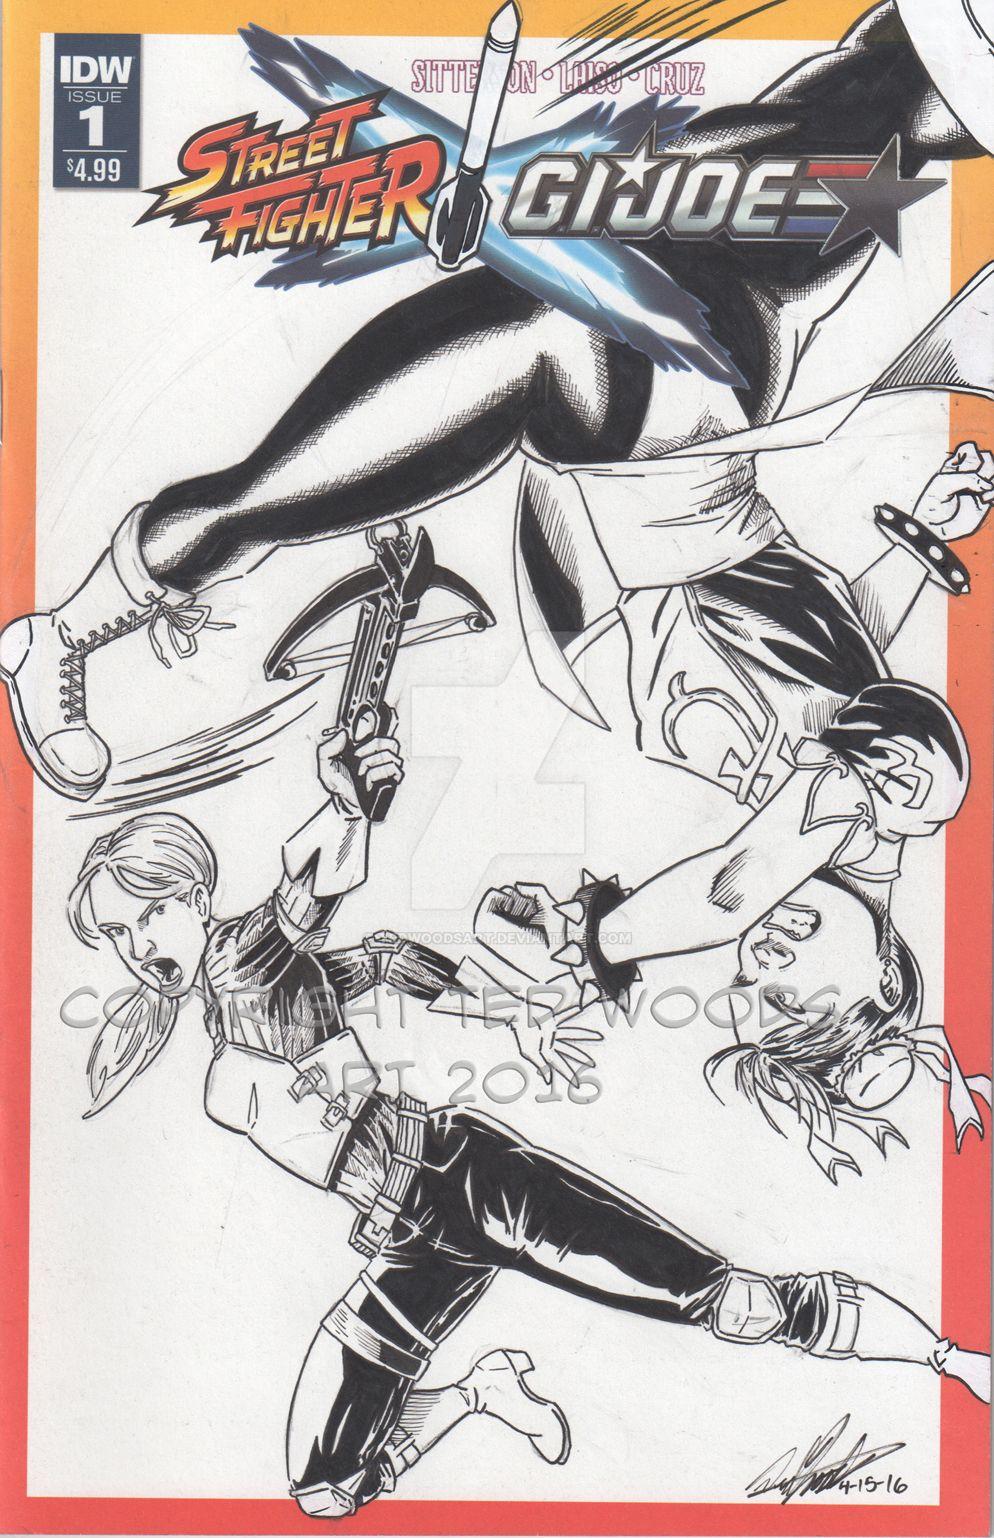 Street Fighter GI Joe Sketch Cover by tedwoodsart